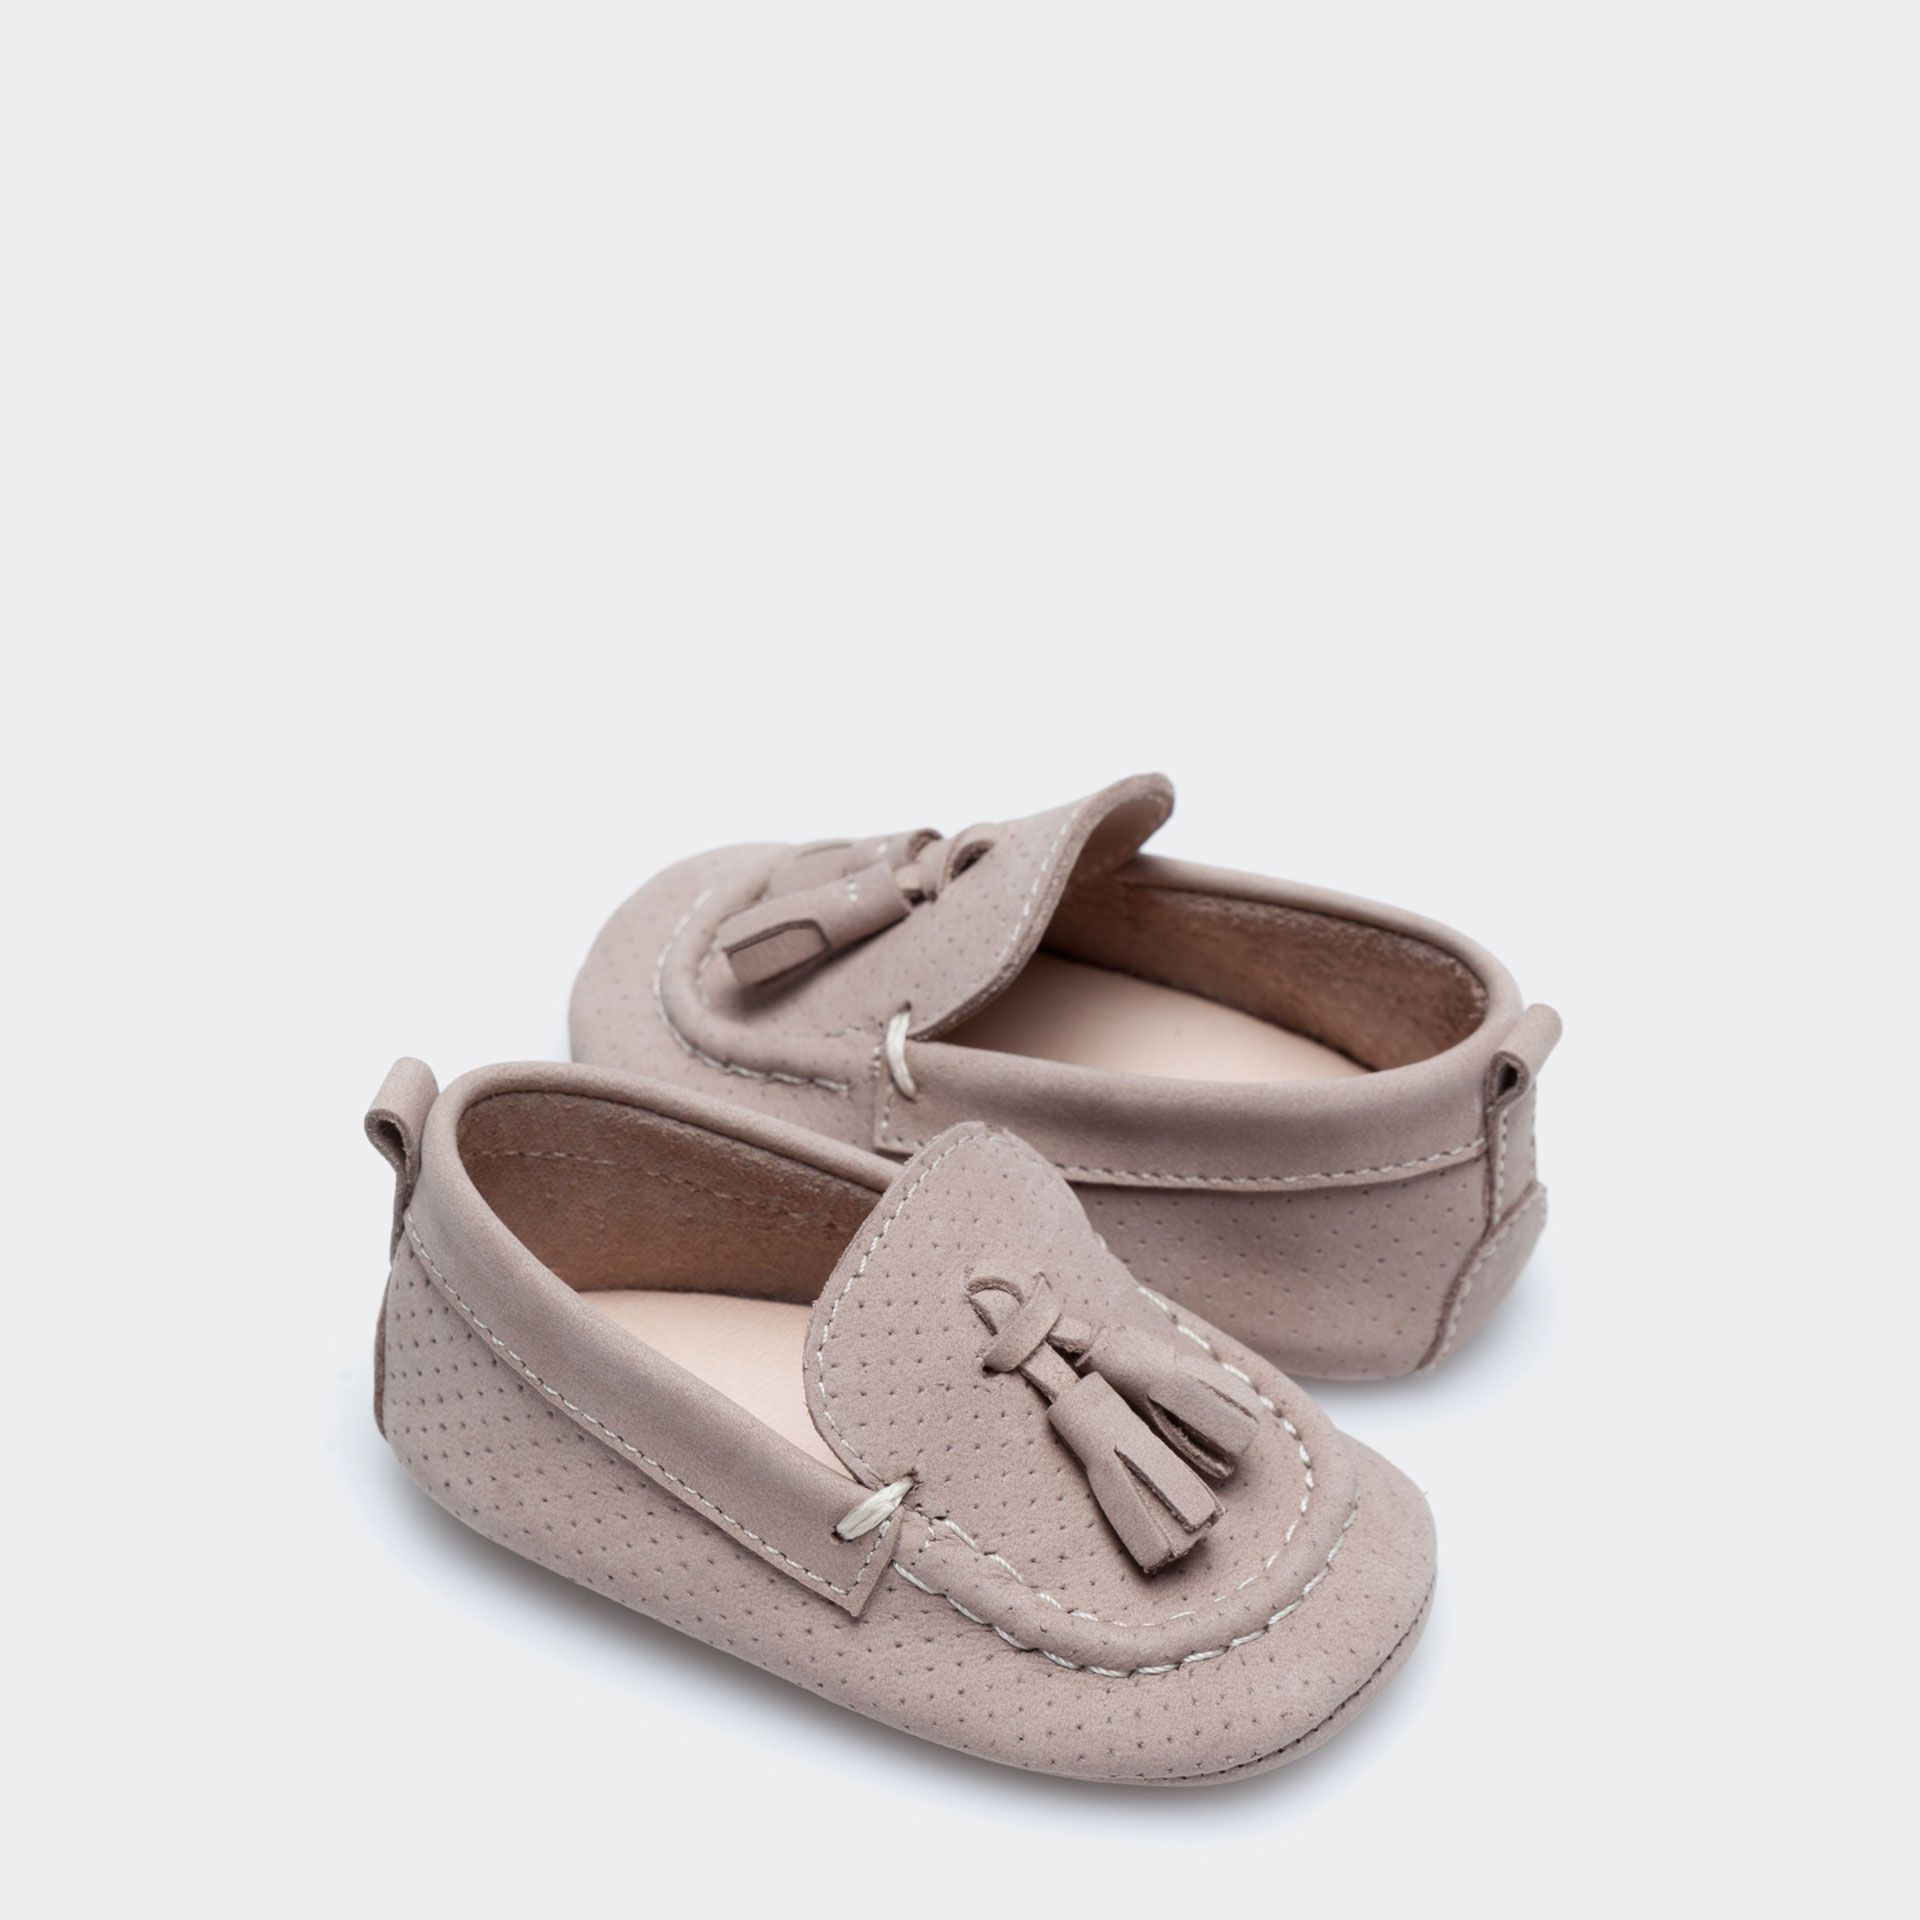 MOCASSIN BOY Baby Homewear & shoes Zara Home Holland